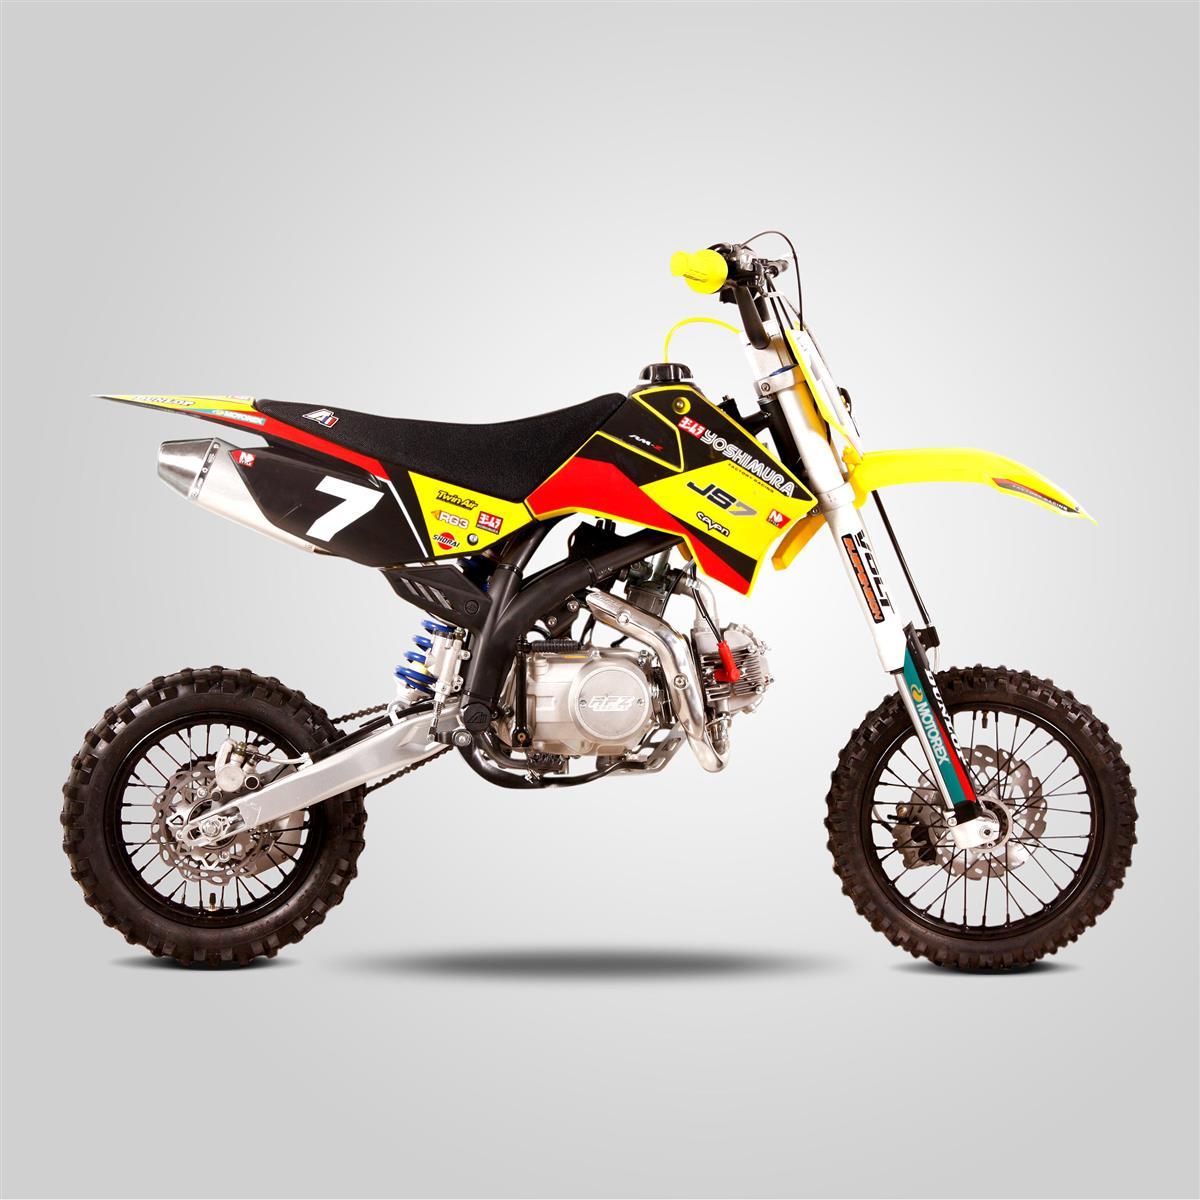 minicross apollo rfz open 125 james stewart 7 smallmx dirt bike pit bike quads minimoto. Black Bedroom Furniture Sets. Home Design Ideas